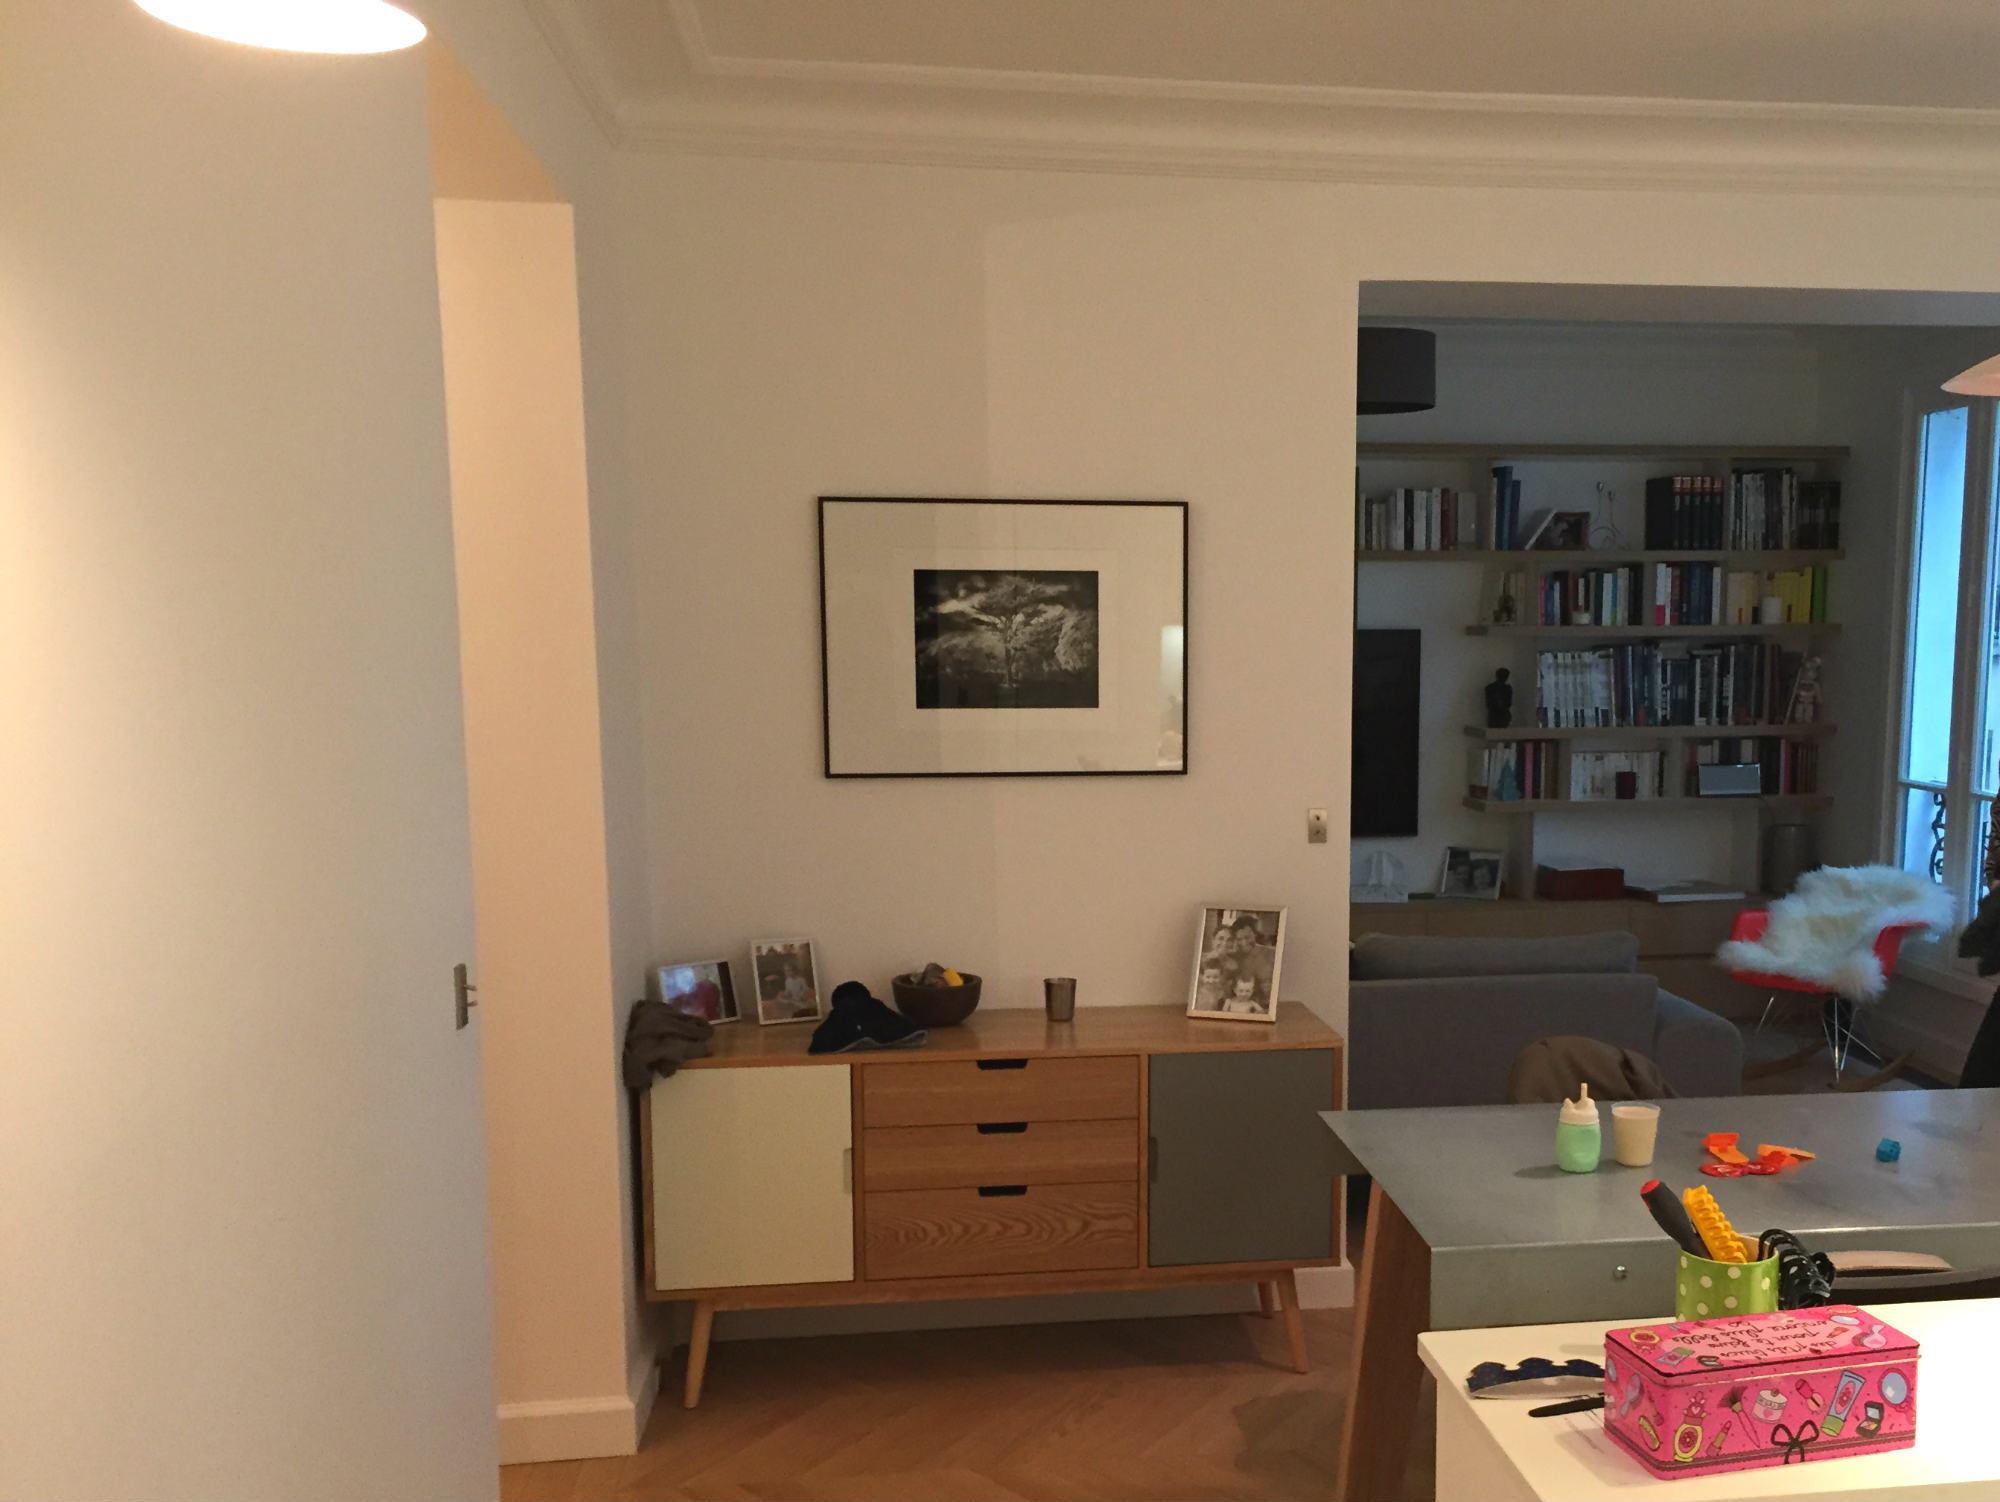 2016 travaux renovation appartement transformation F2 en F3 Paris rue Damremont_Eolh btp france 13